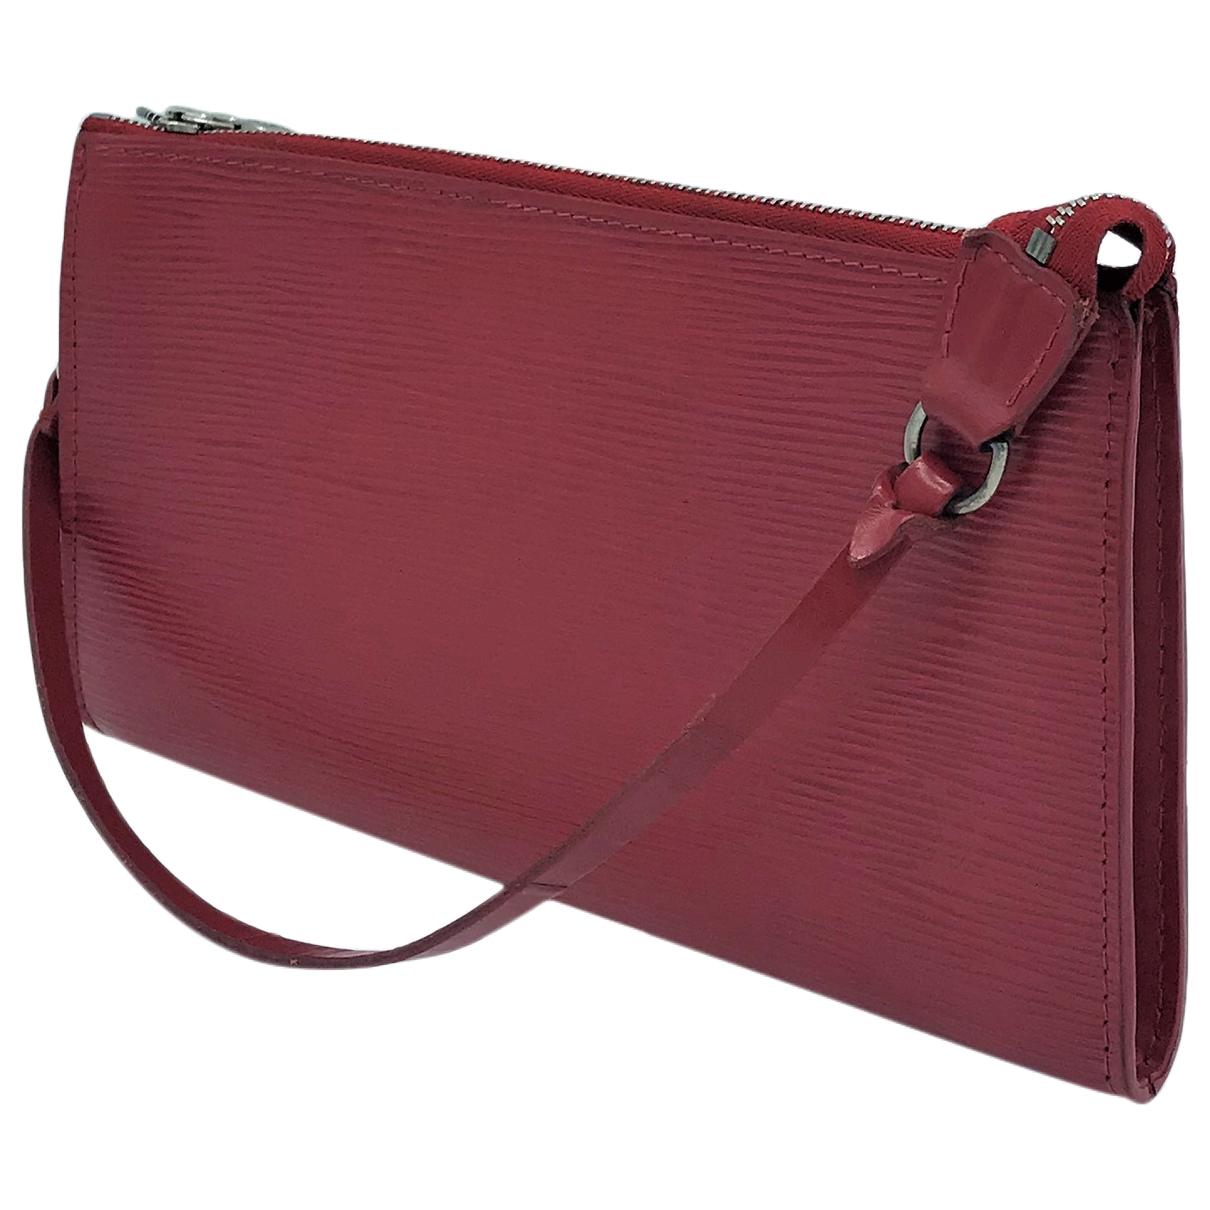 Louis Vuitton Pochette Accessoire Red Leather Clutch bag for Women \N